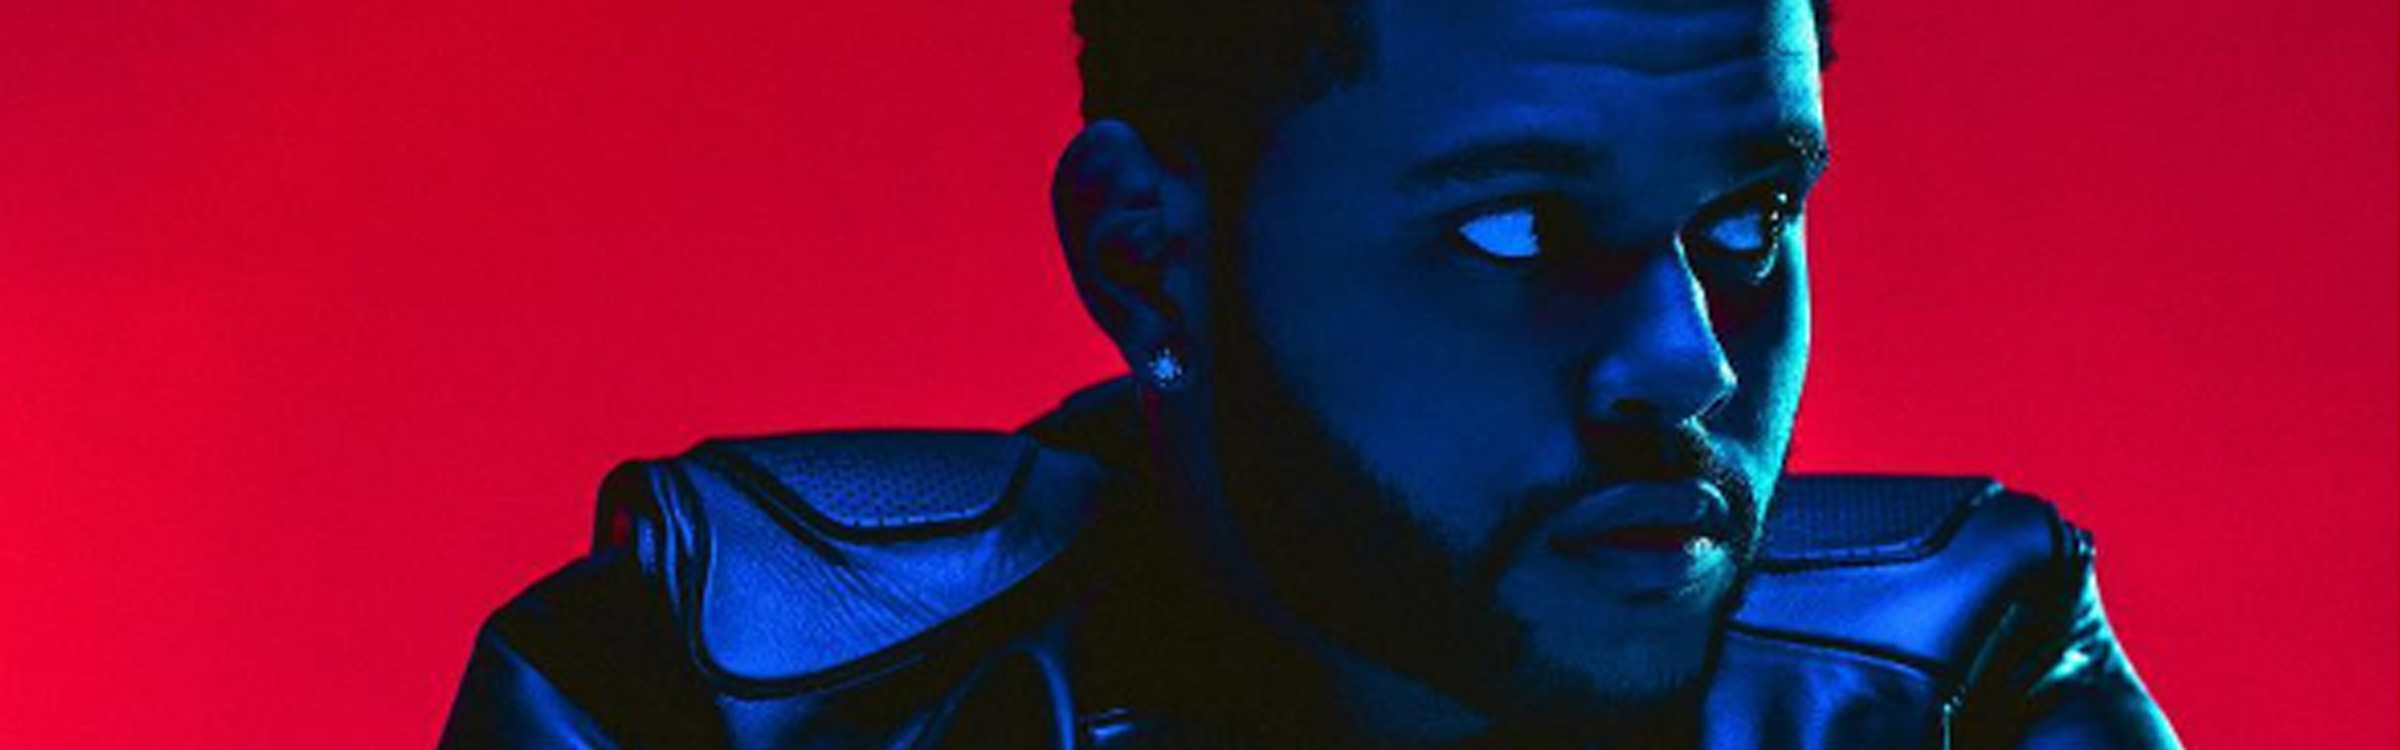 Weeknd header